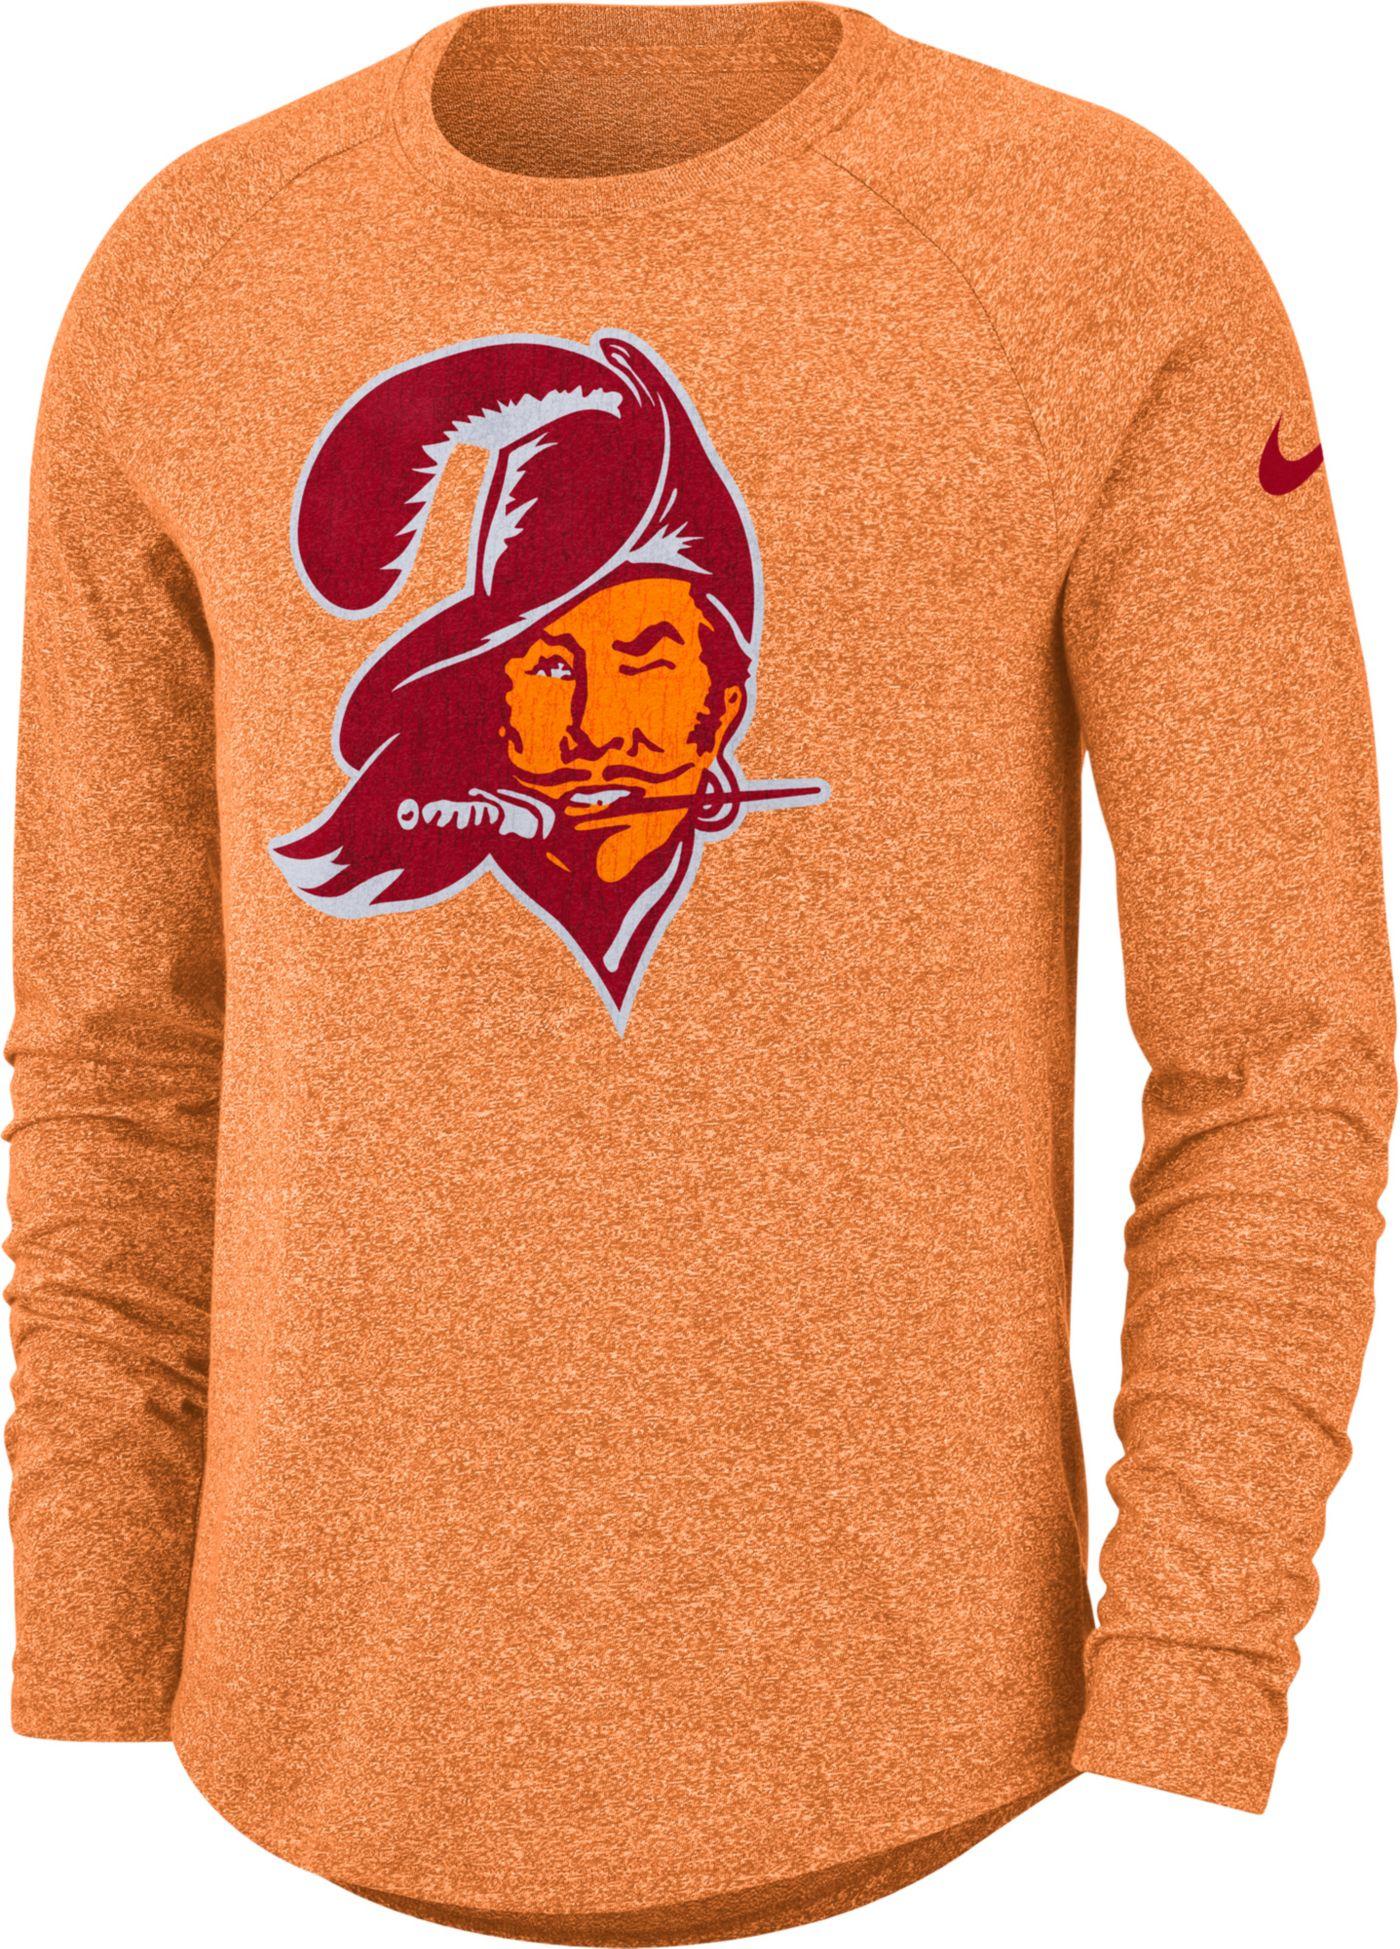 Nike Men's Tampa Bay Buccaneers Marled Historic Performance Orange Long Sleeve Shirt